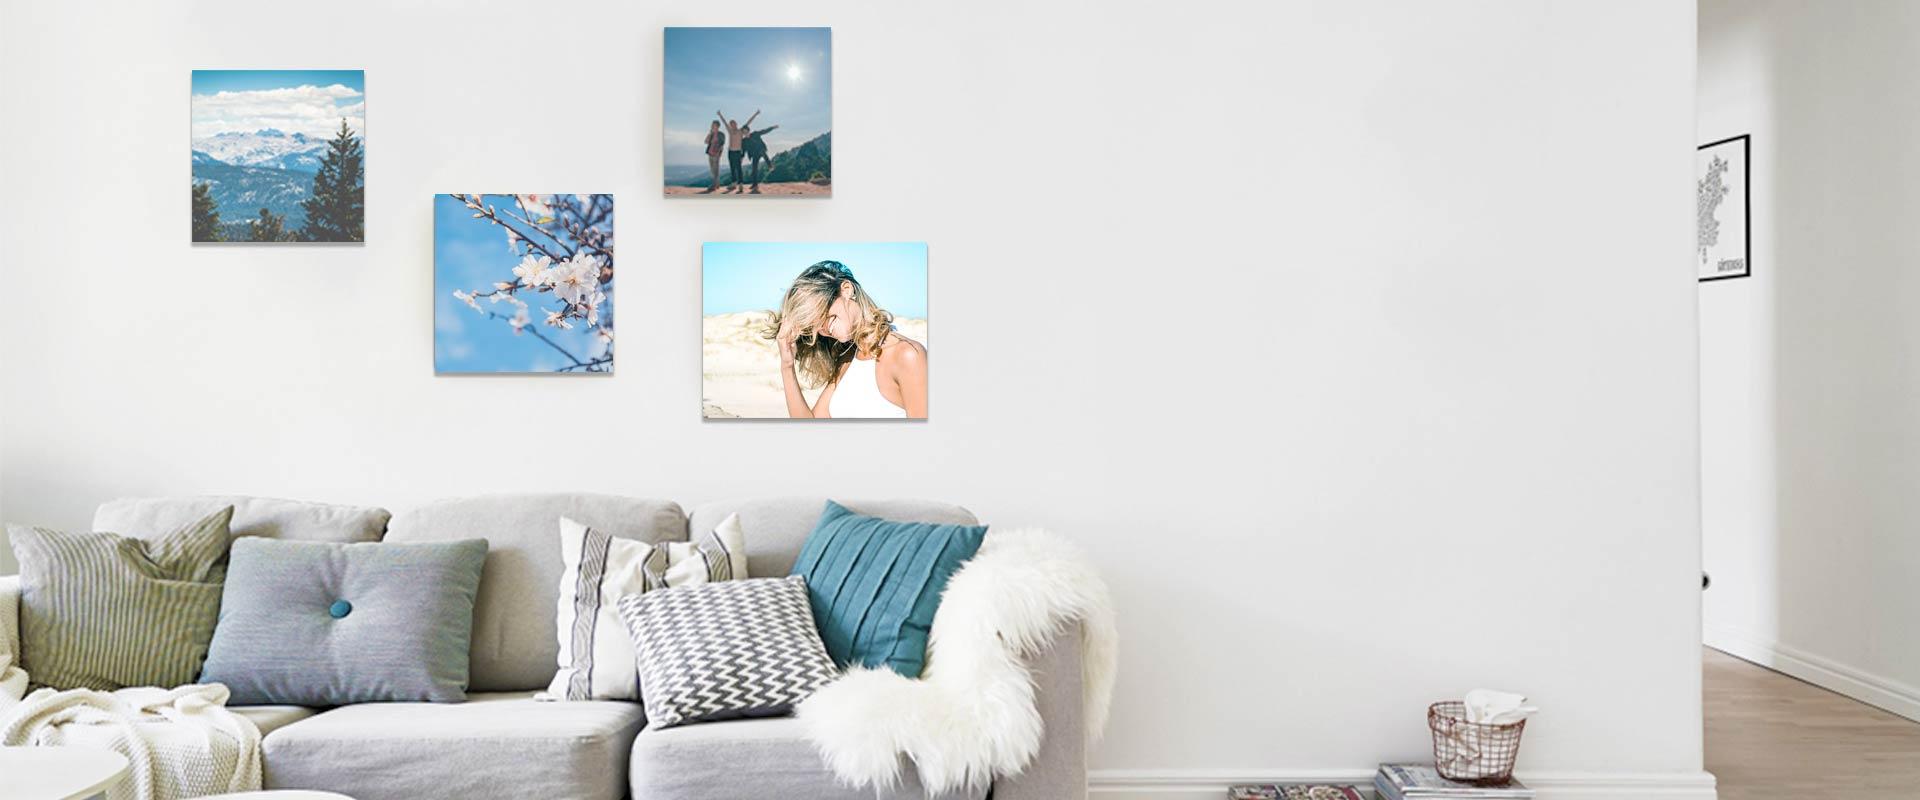 Ikea Stampe Da Muro kastell.it stampa digitale online   fotoquadri   fine art